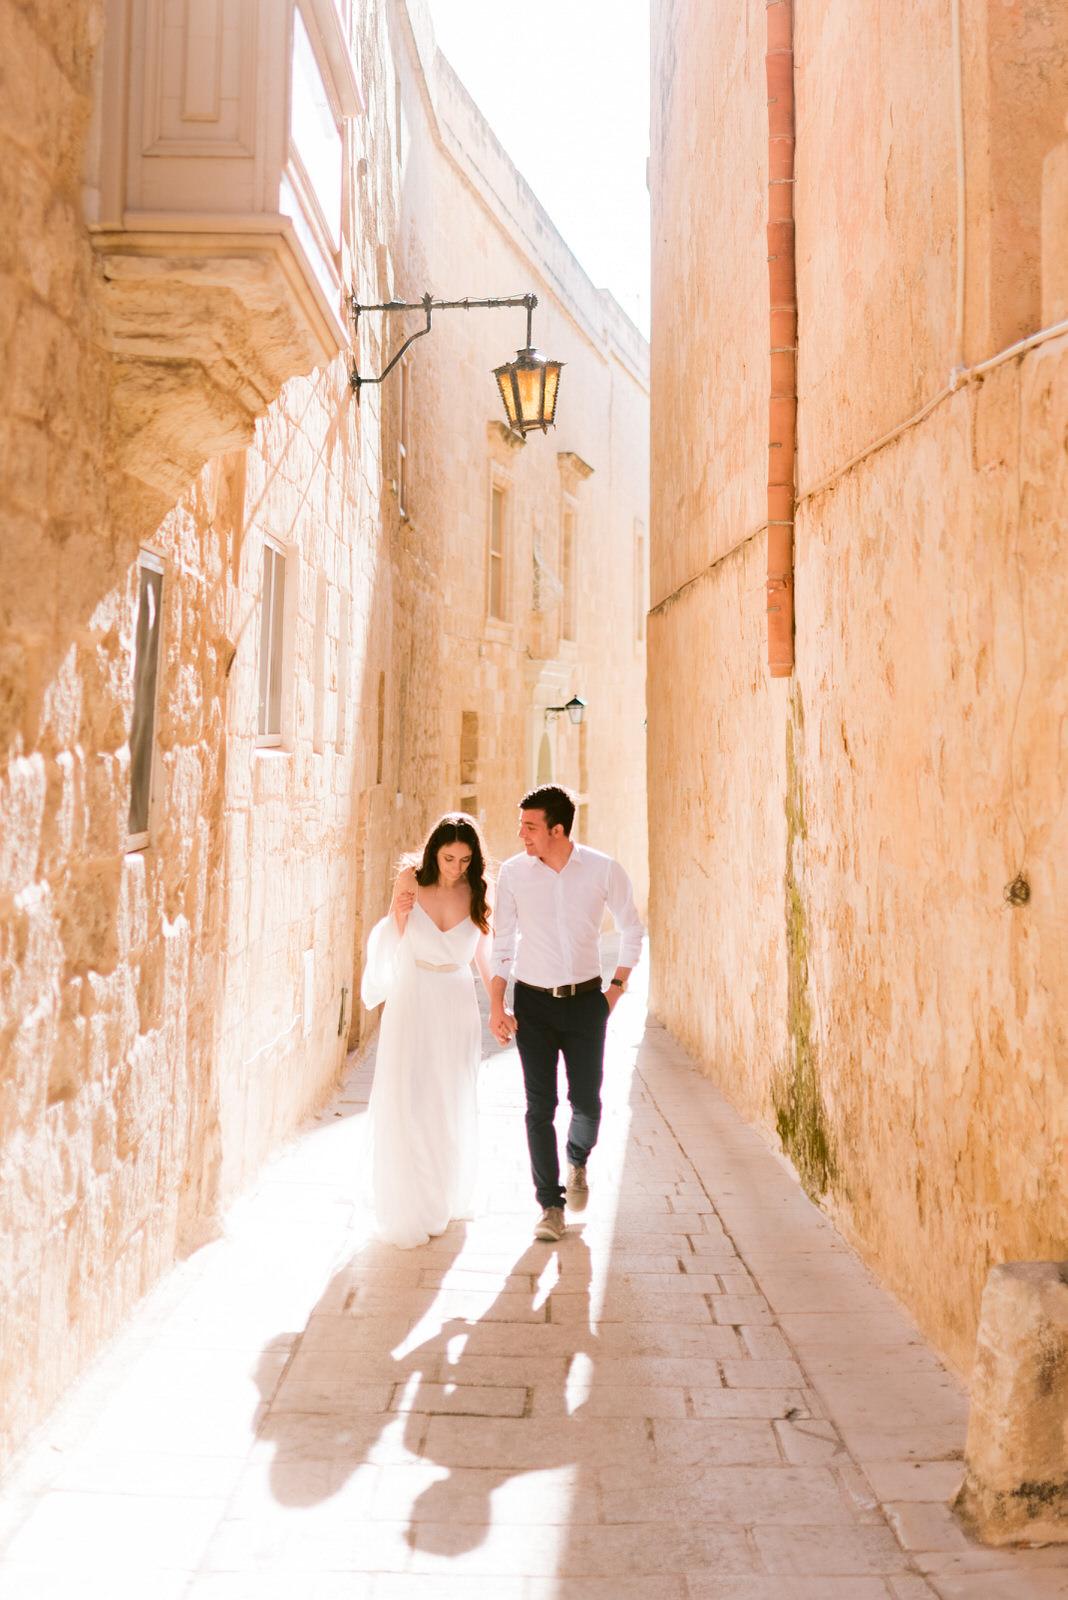 mdina wedding, malta wedding photography, malta elopement, golden bay malta wedding photos, wedding photographer malta, malta wedding venue, villa bologna wedding (30).jpg